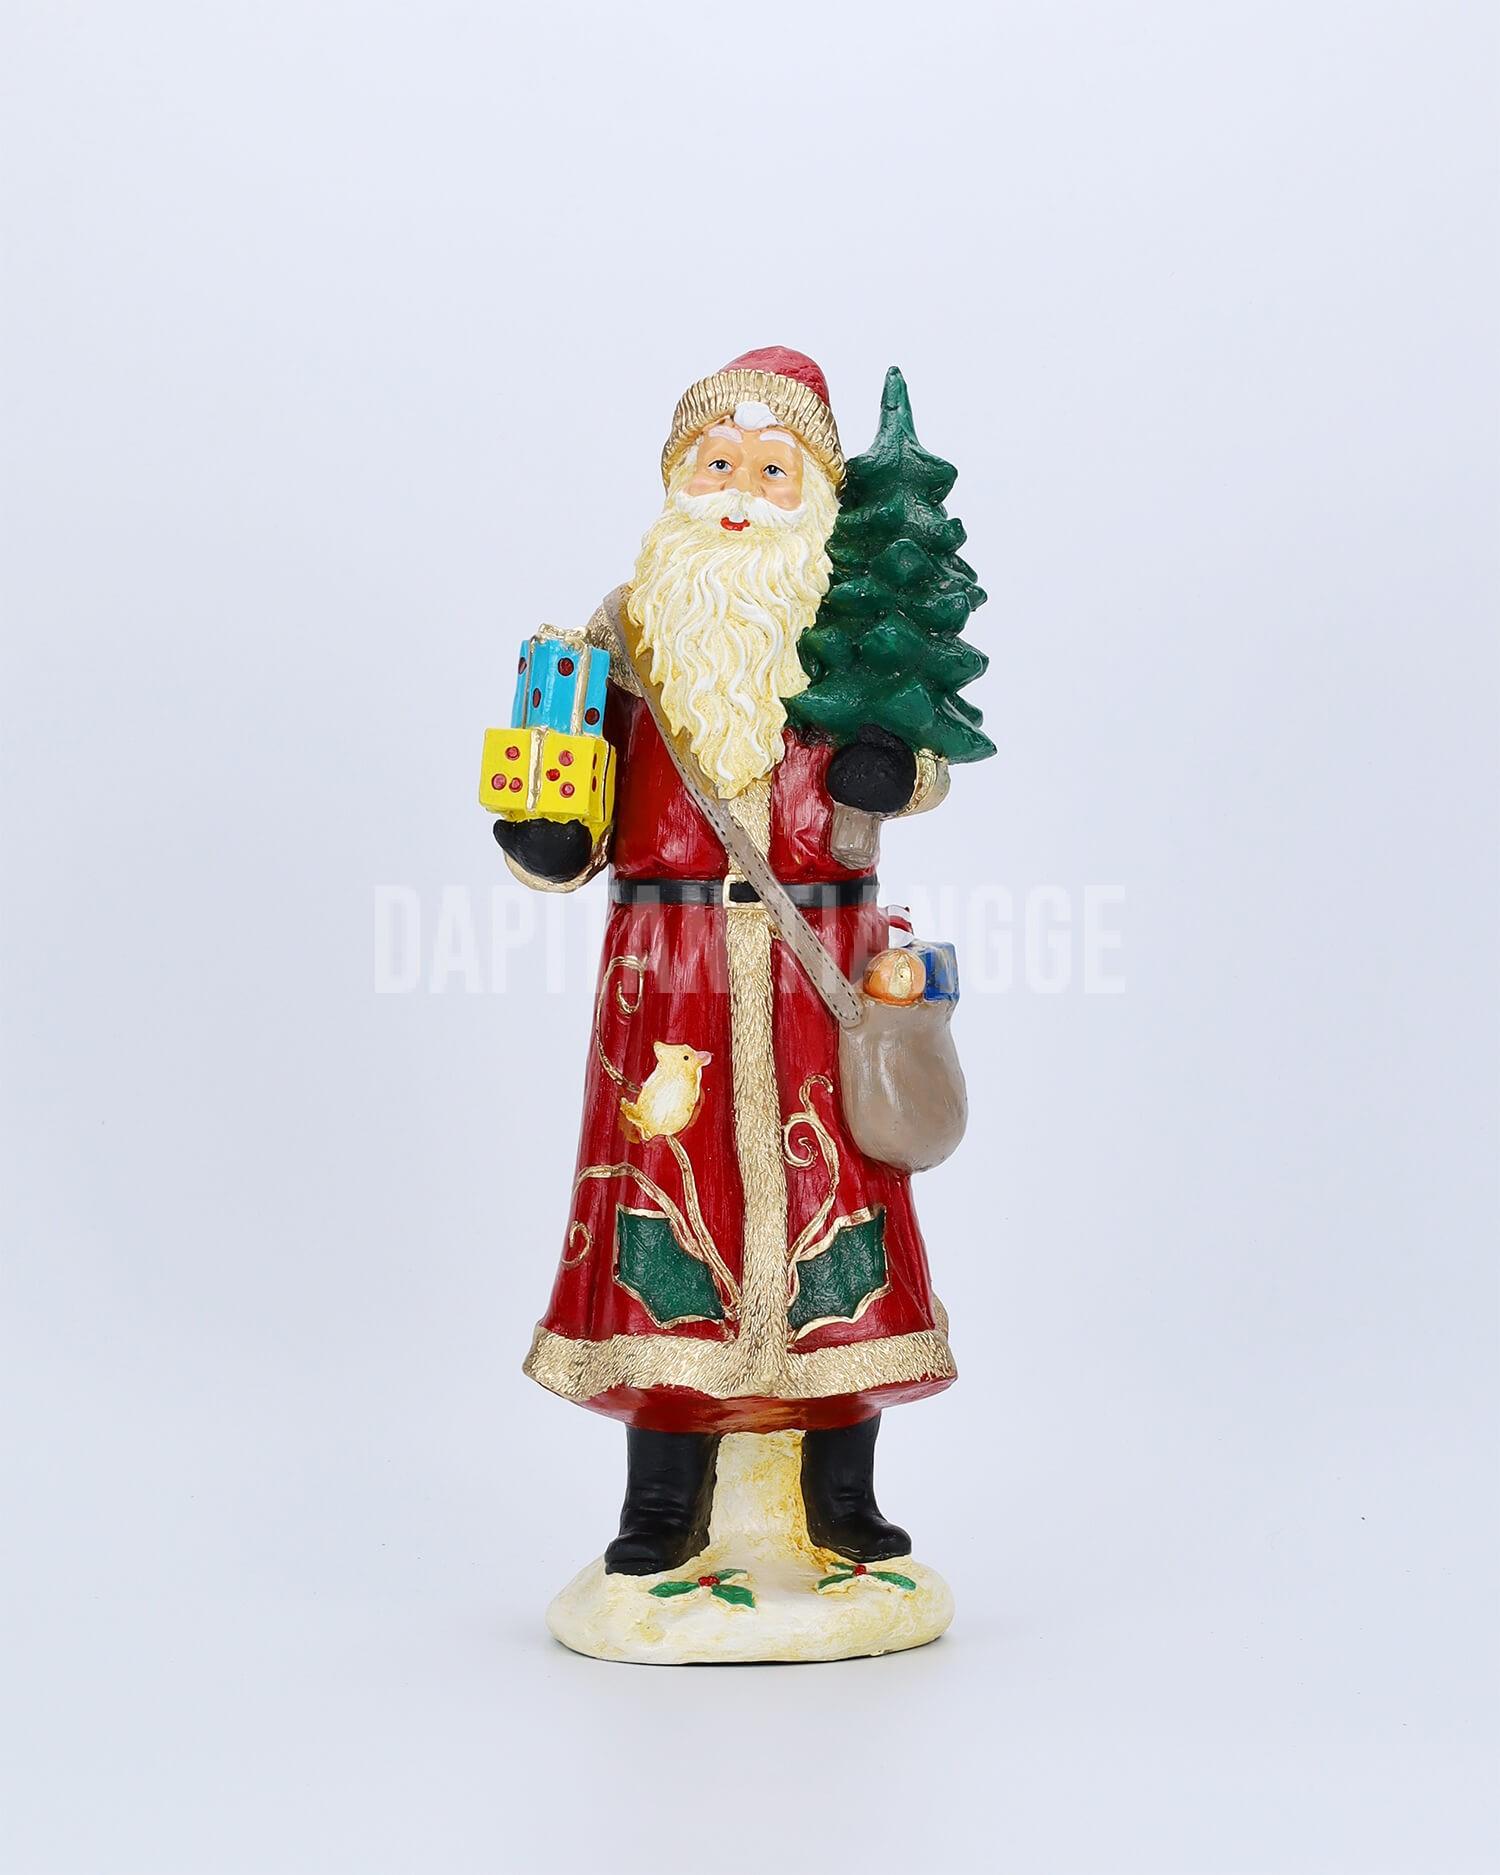 Dapitan Tiangge Santa Carrying Gifts and Christmas Tree Decor